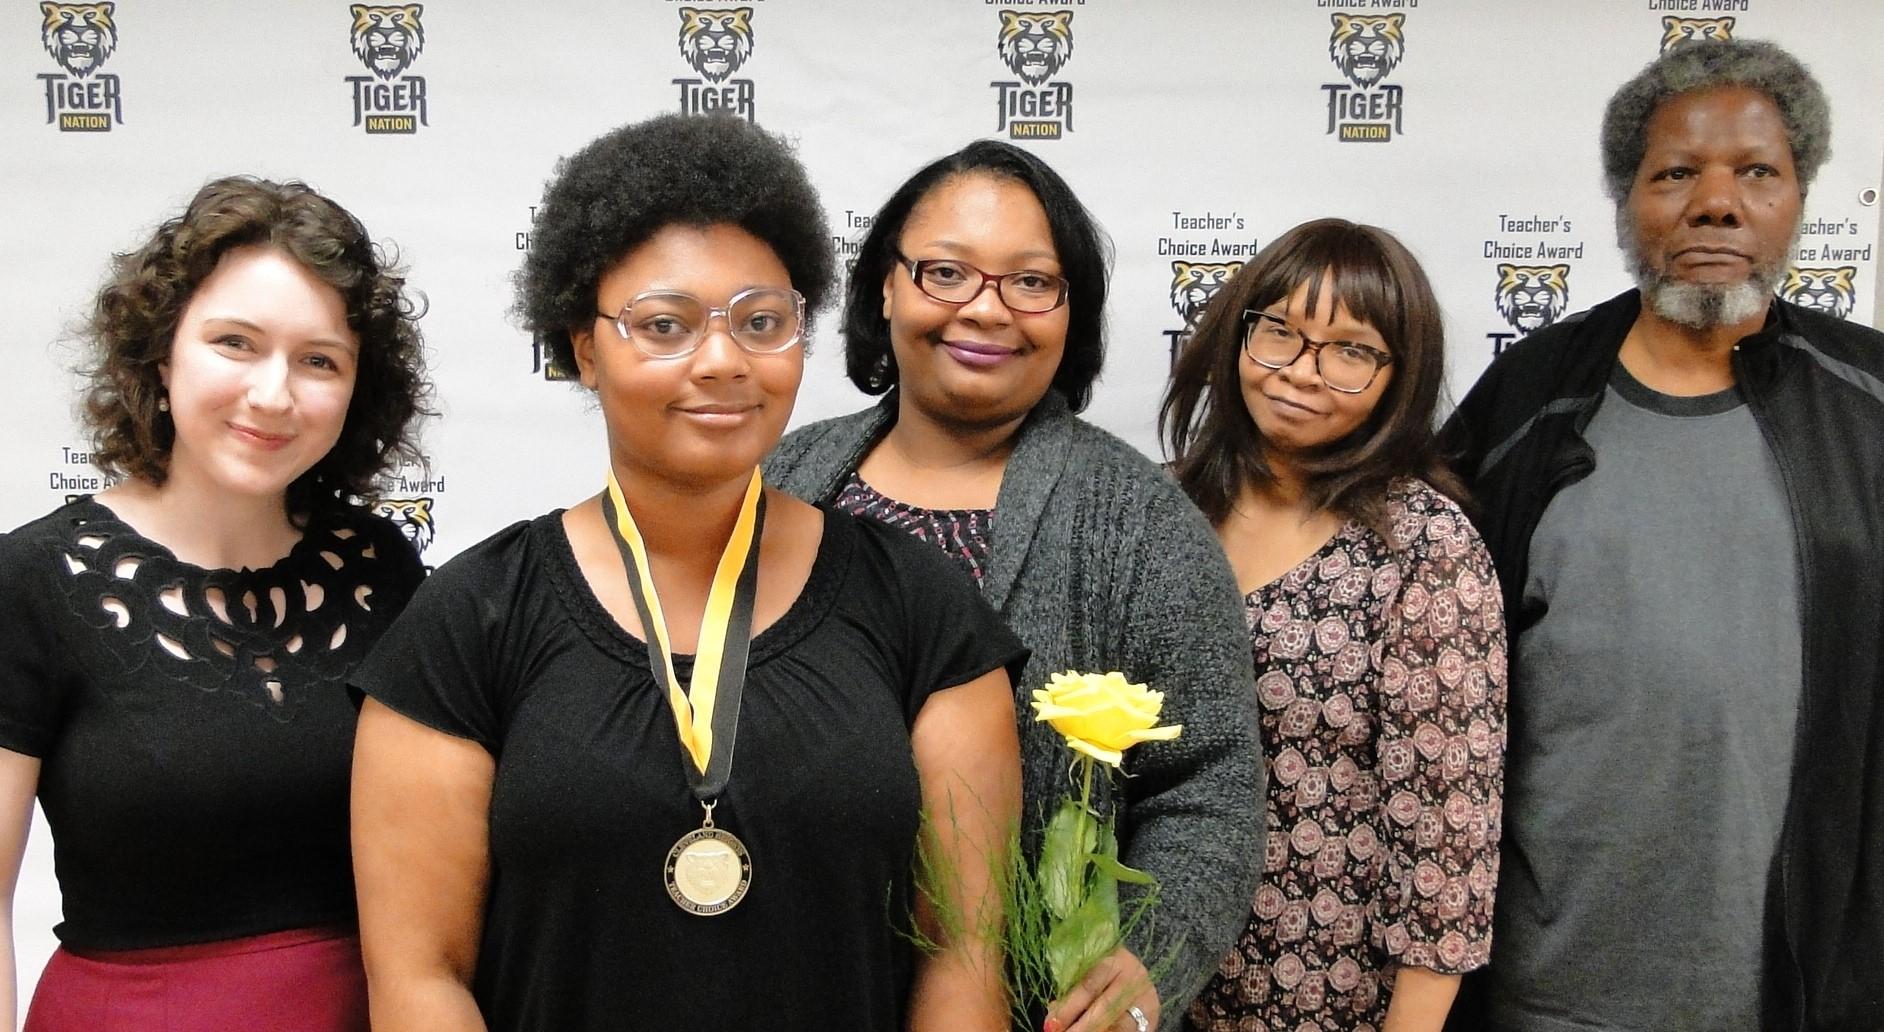 Maria Vaughn Jones recognized by Ms. Raack